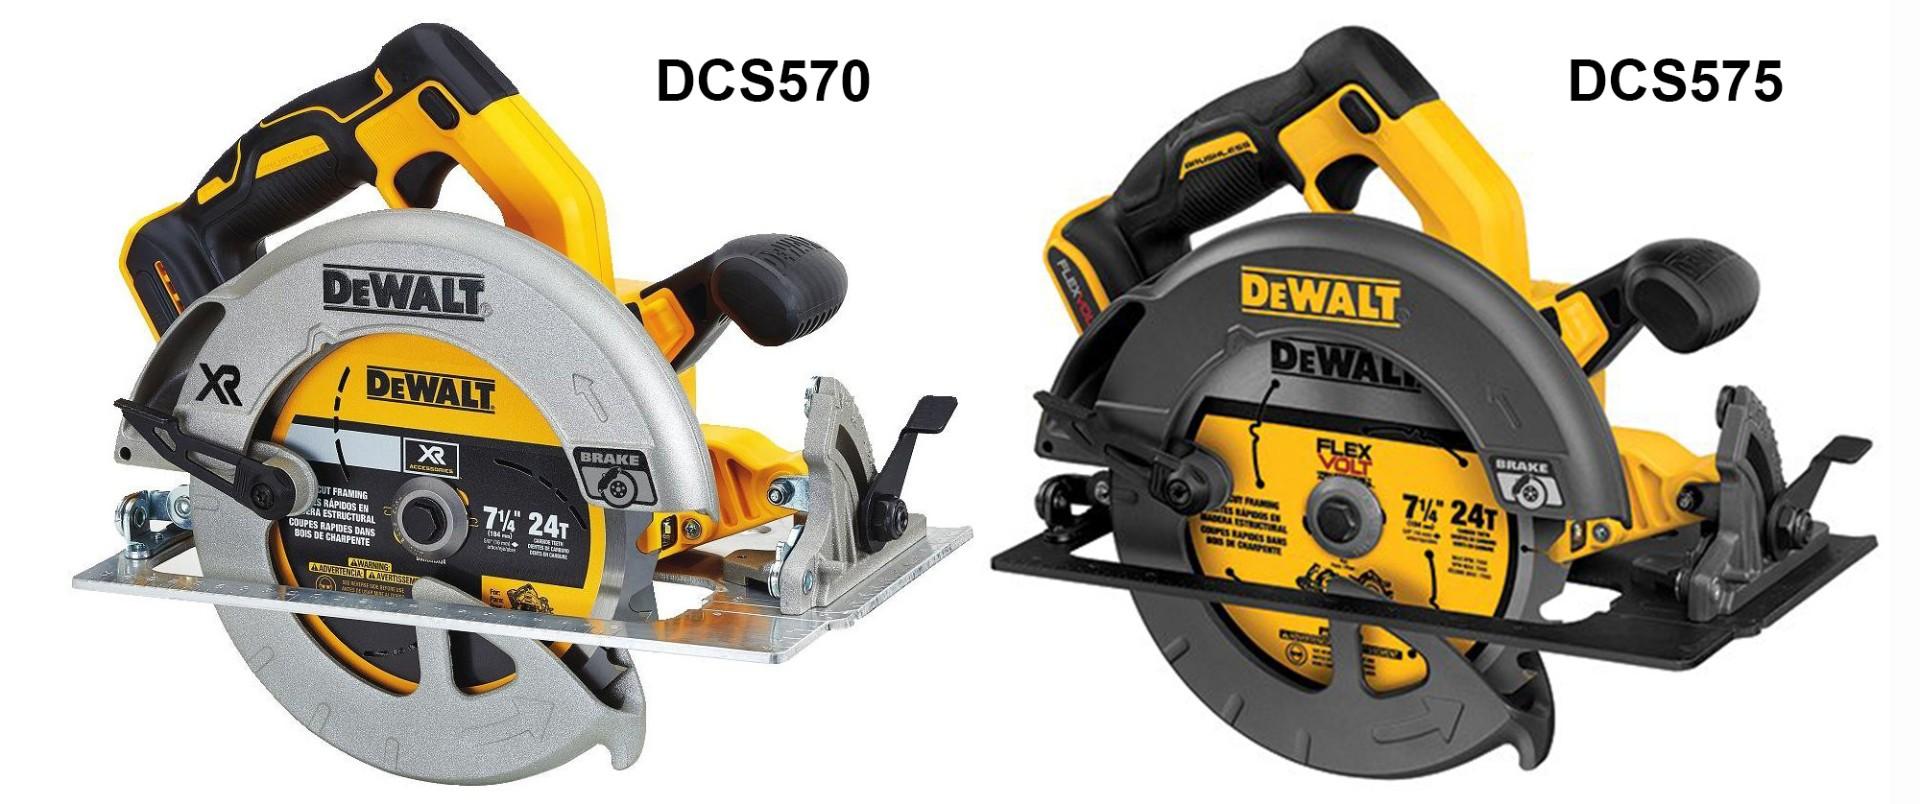 Dewalt Dcs570 vs Dcs575